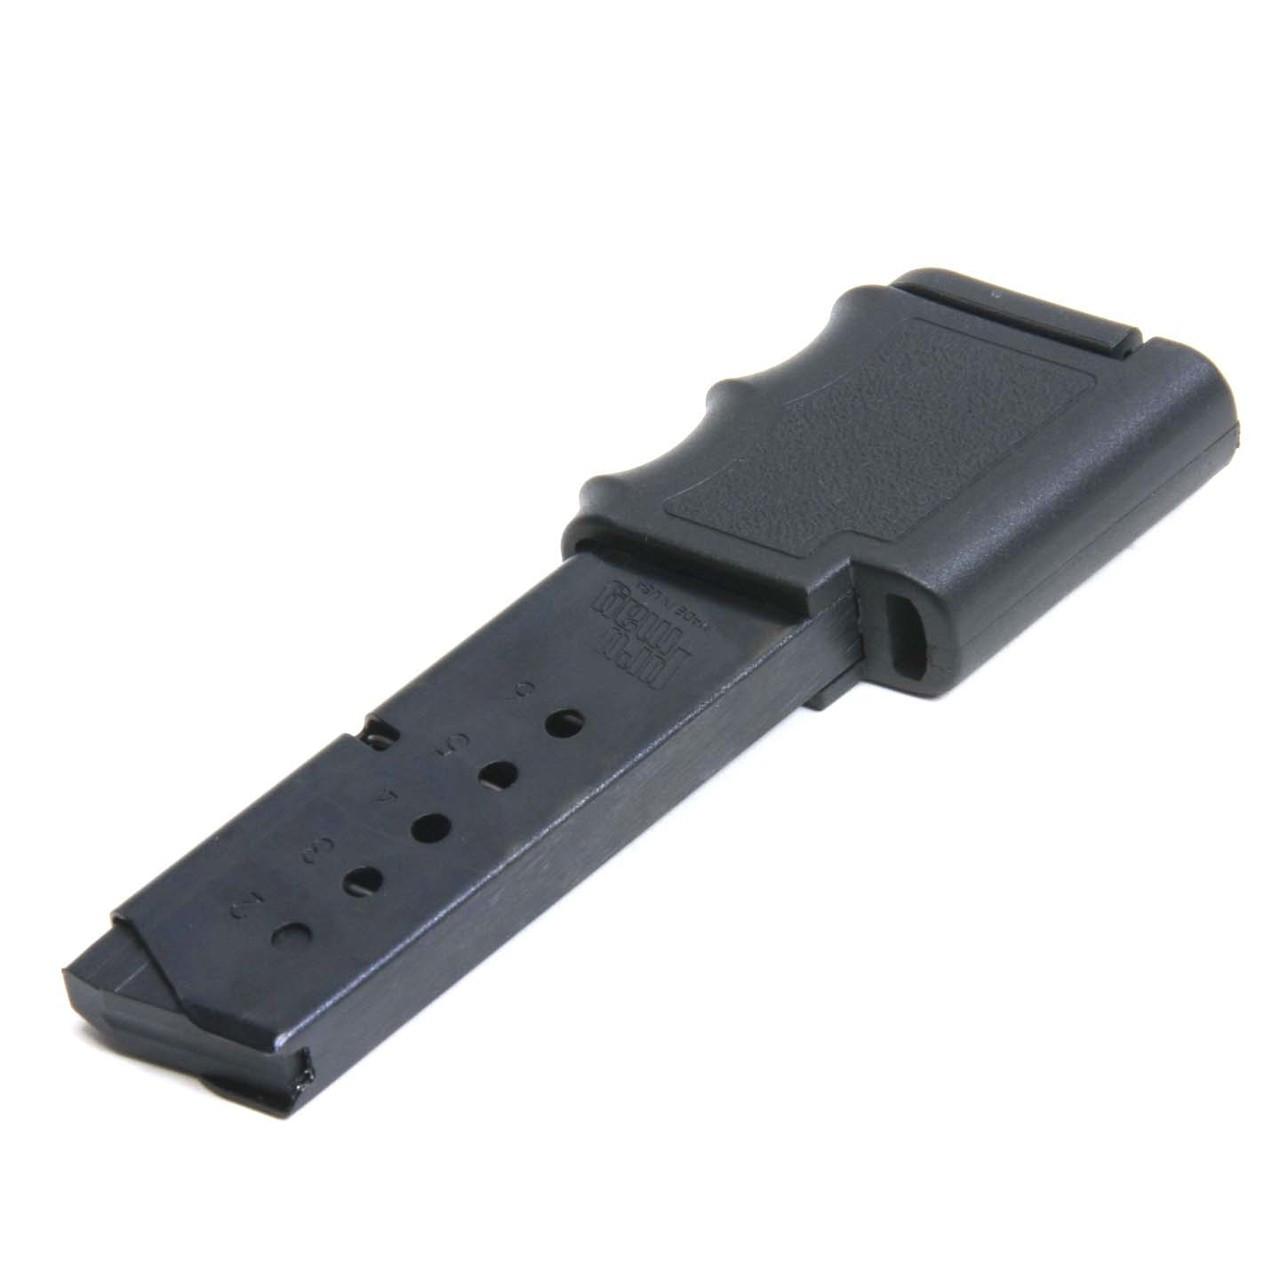 Smith & Wesson® Bodyguard® .380 ACP (10) Rd - Blue Steel